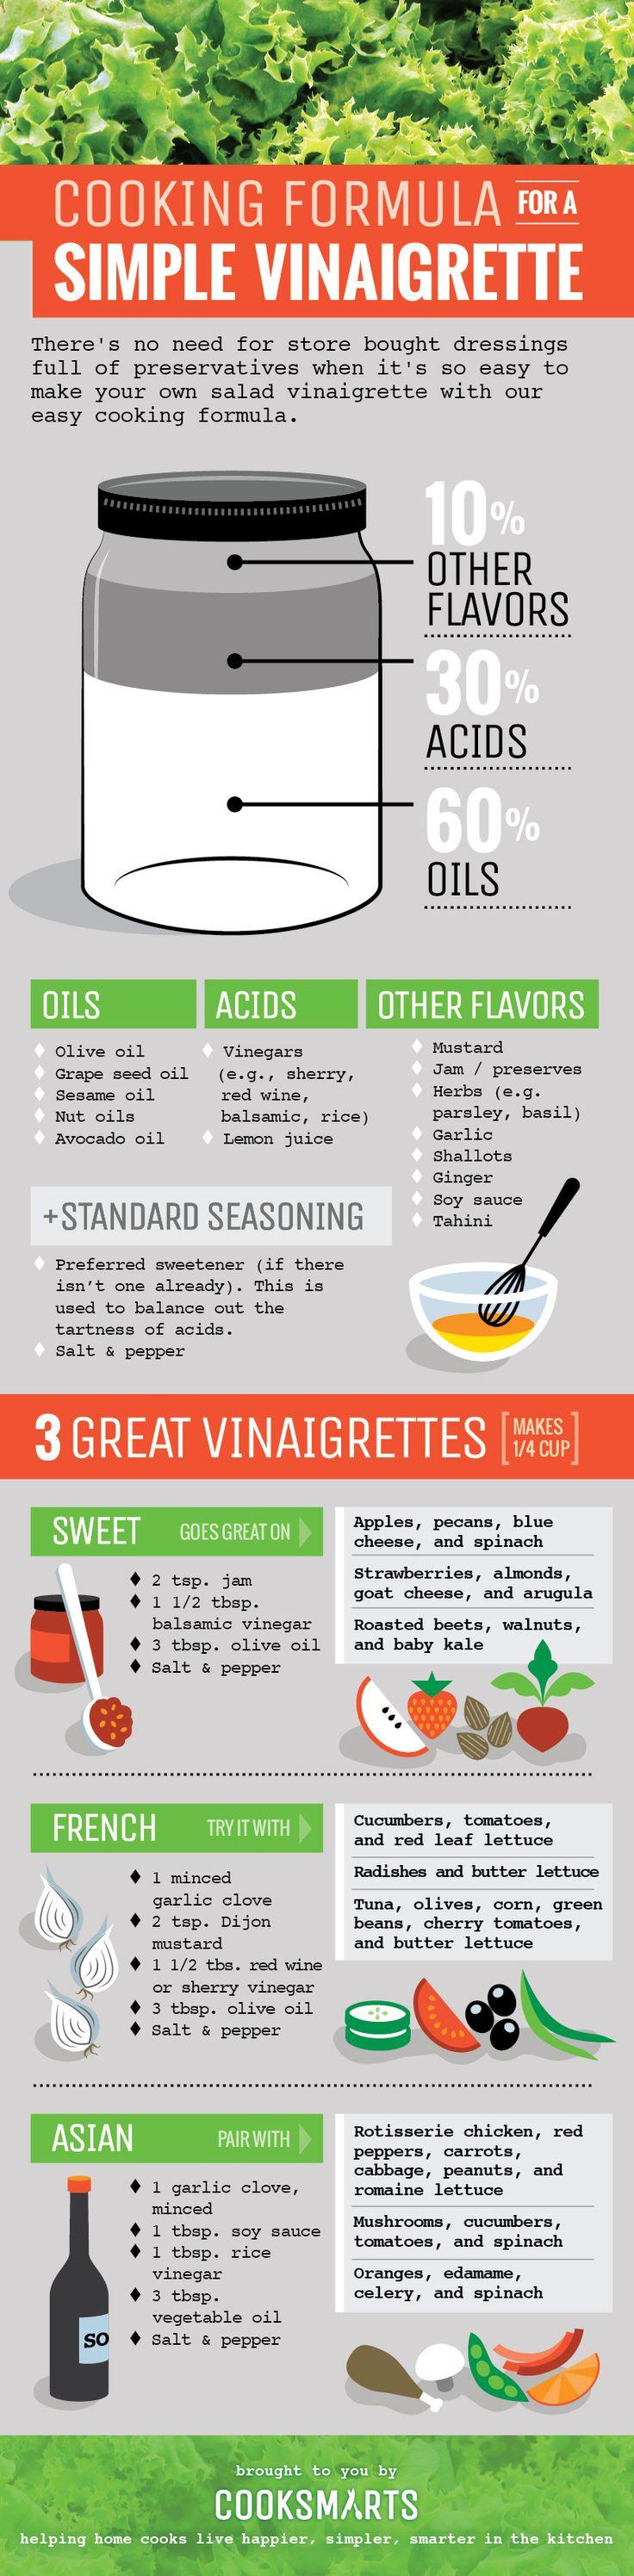 Cooking Formulas for Salad Vinaigrettes via cooksmarts #Infographic #Salad_Dressing #Vinaigrette